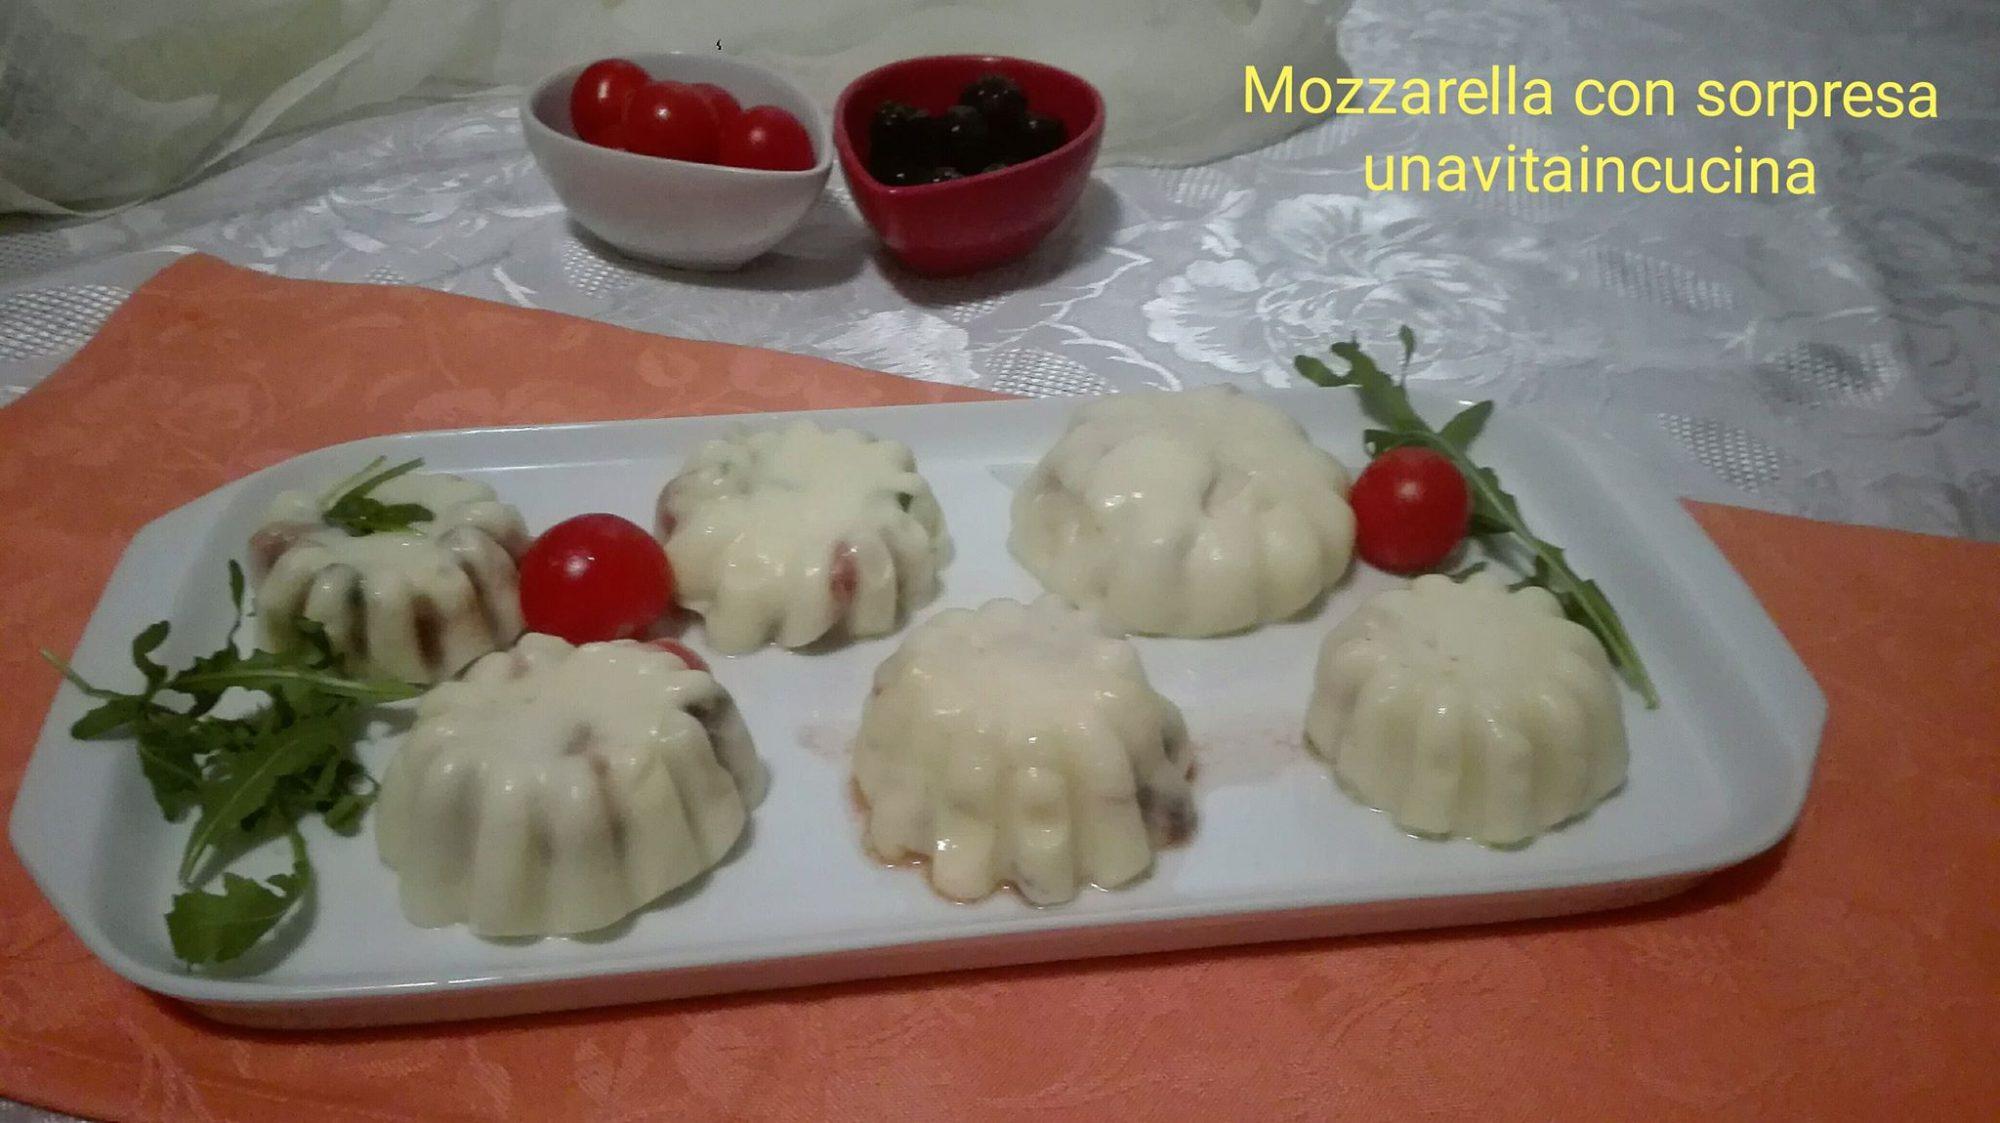 Mozzarella con sorpresa